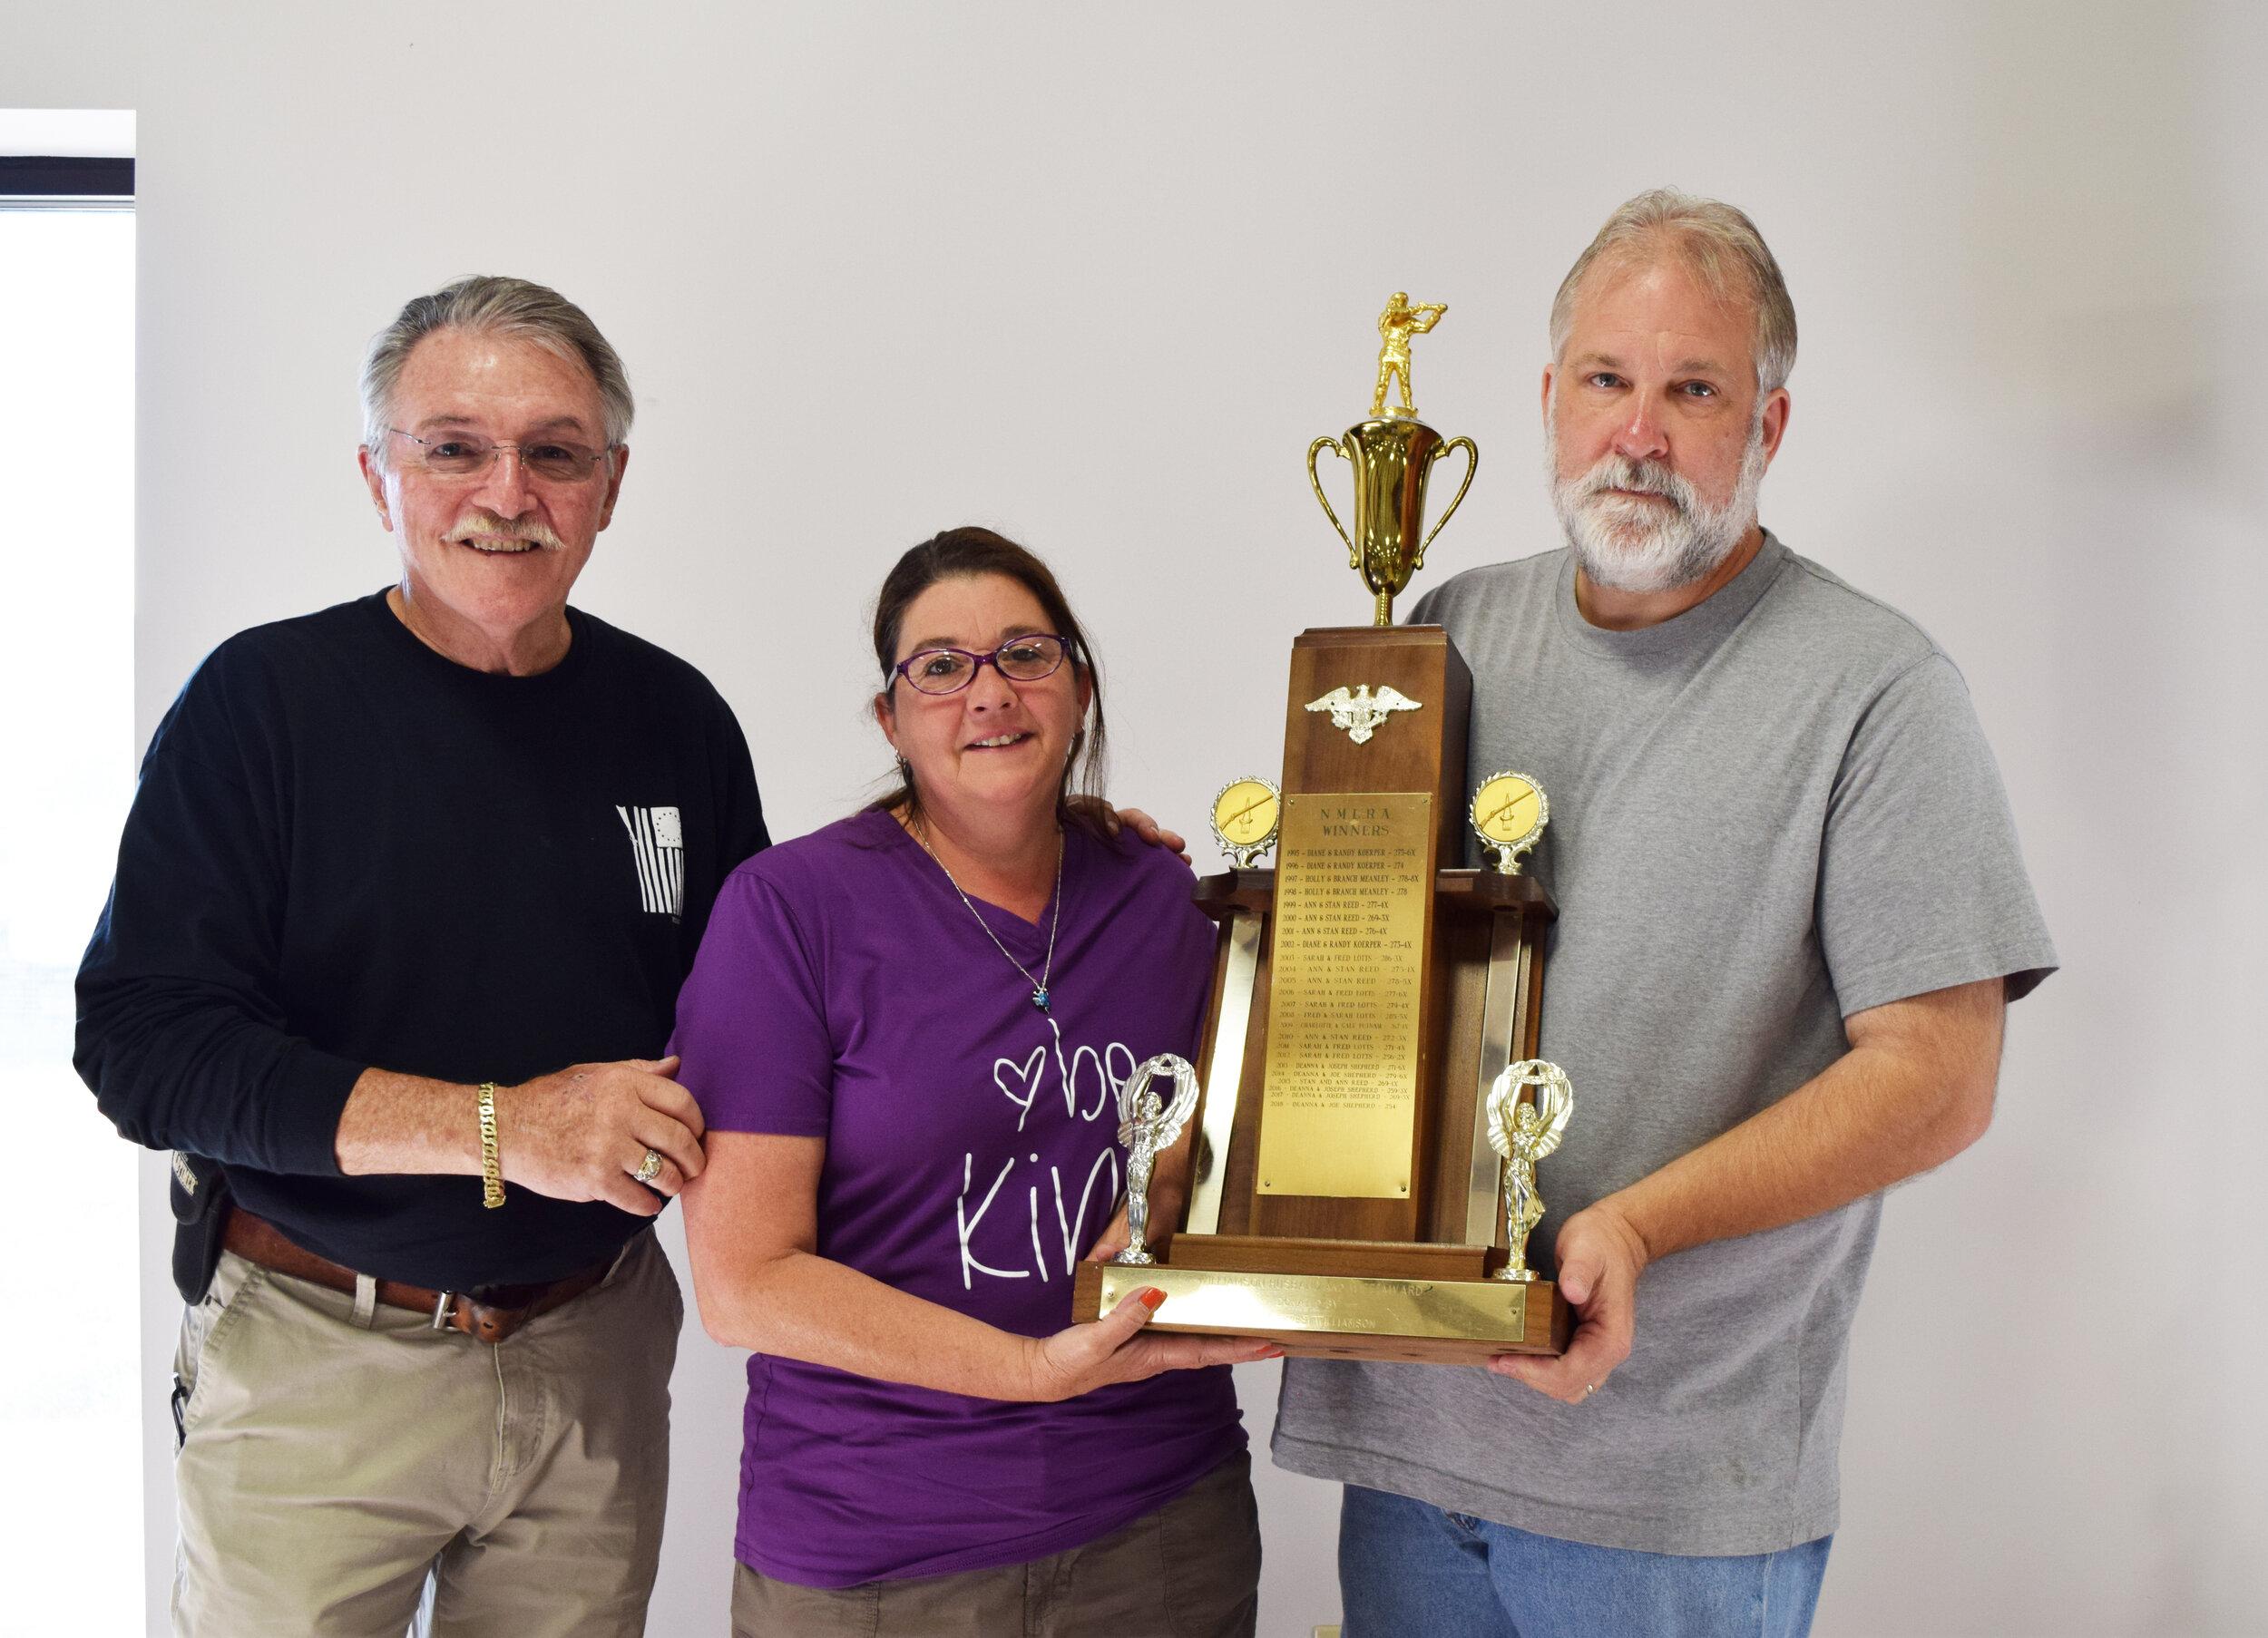 Robert & Deana Shepherd - Aggregate EE - Husband and Wife Championship Winners along with NMLRA President Brent Steele